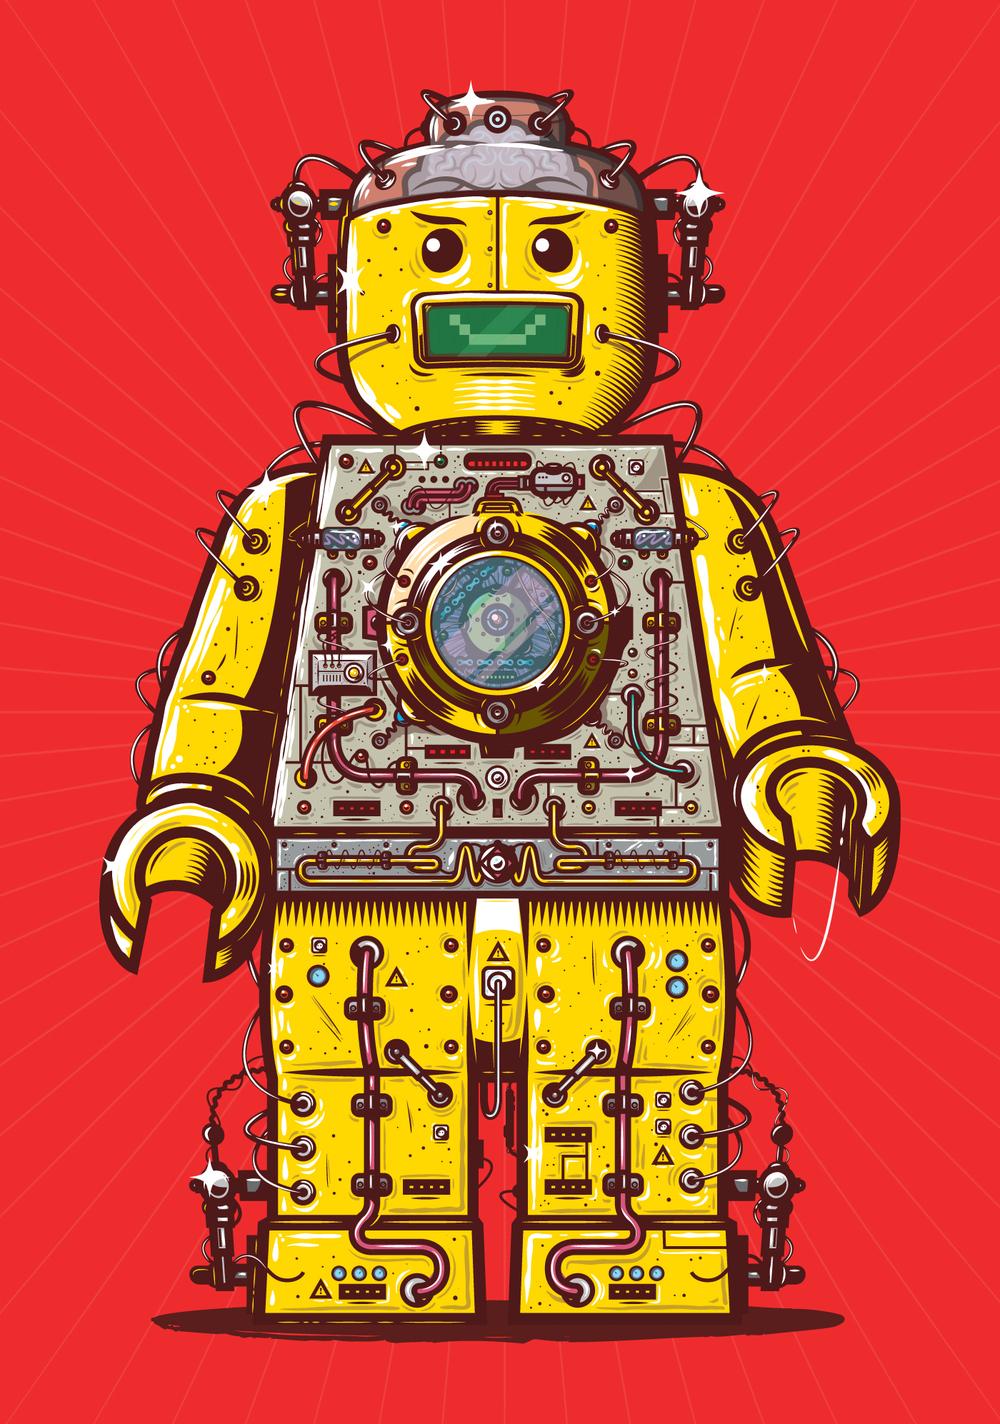 Musketon Lego